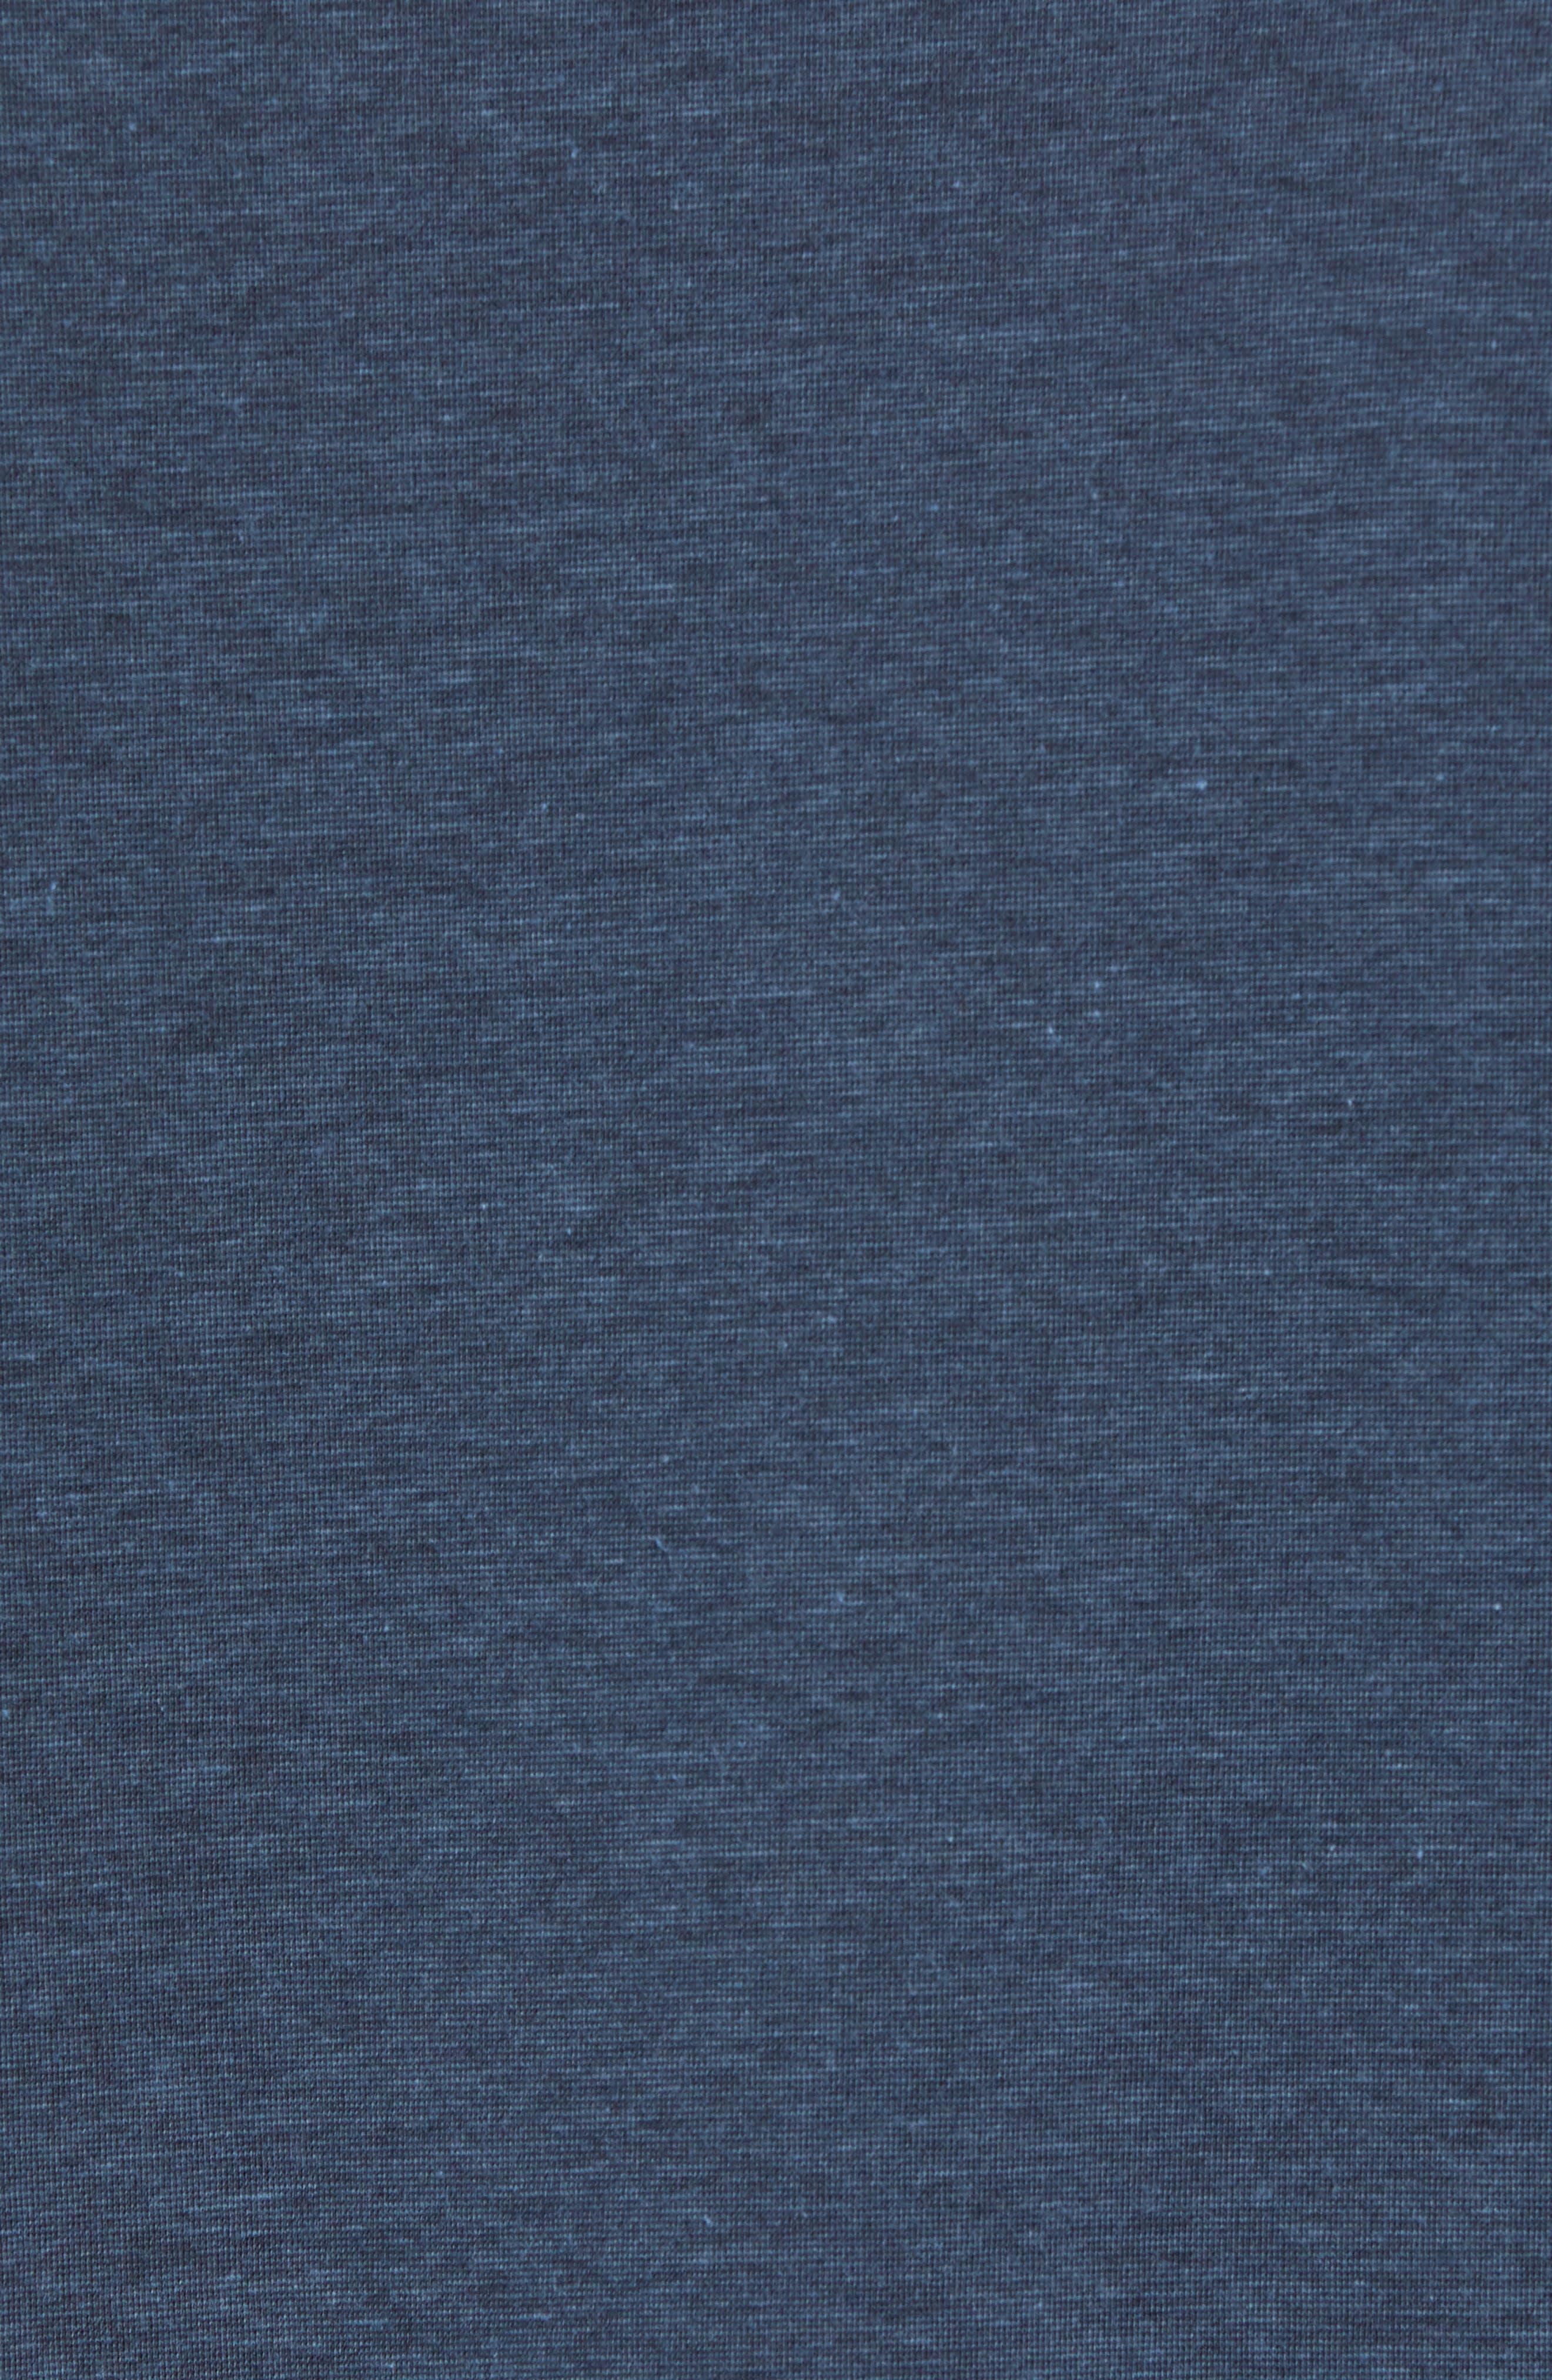 Laze T-Shirt,                             Alternate thumbnail 5, color,                             TRUE NAVY/ BLACK